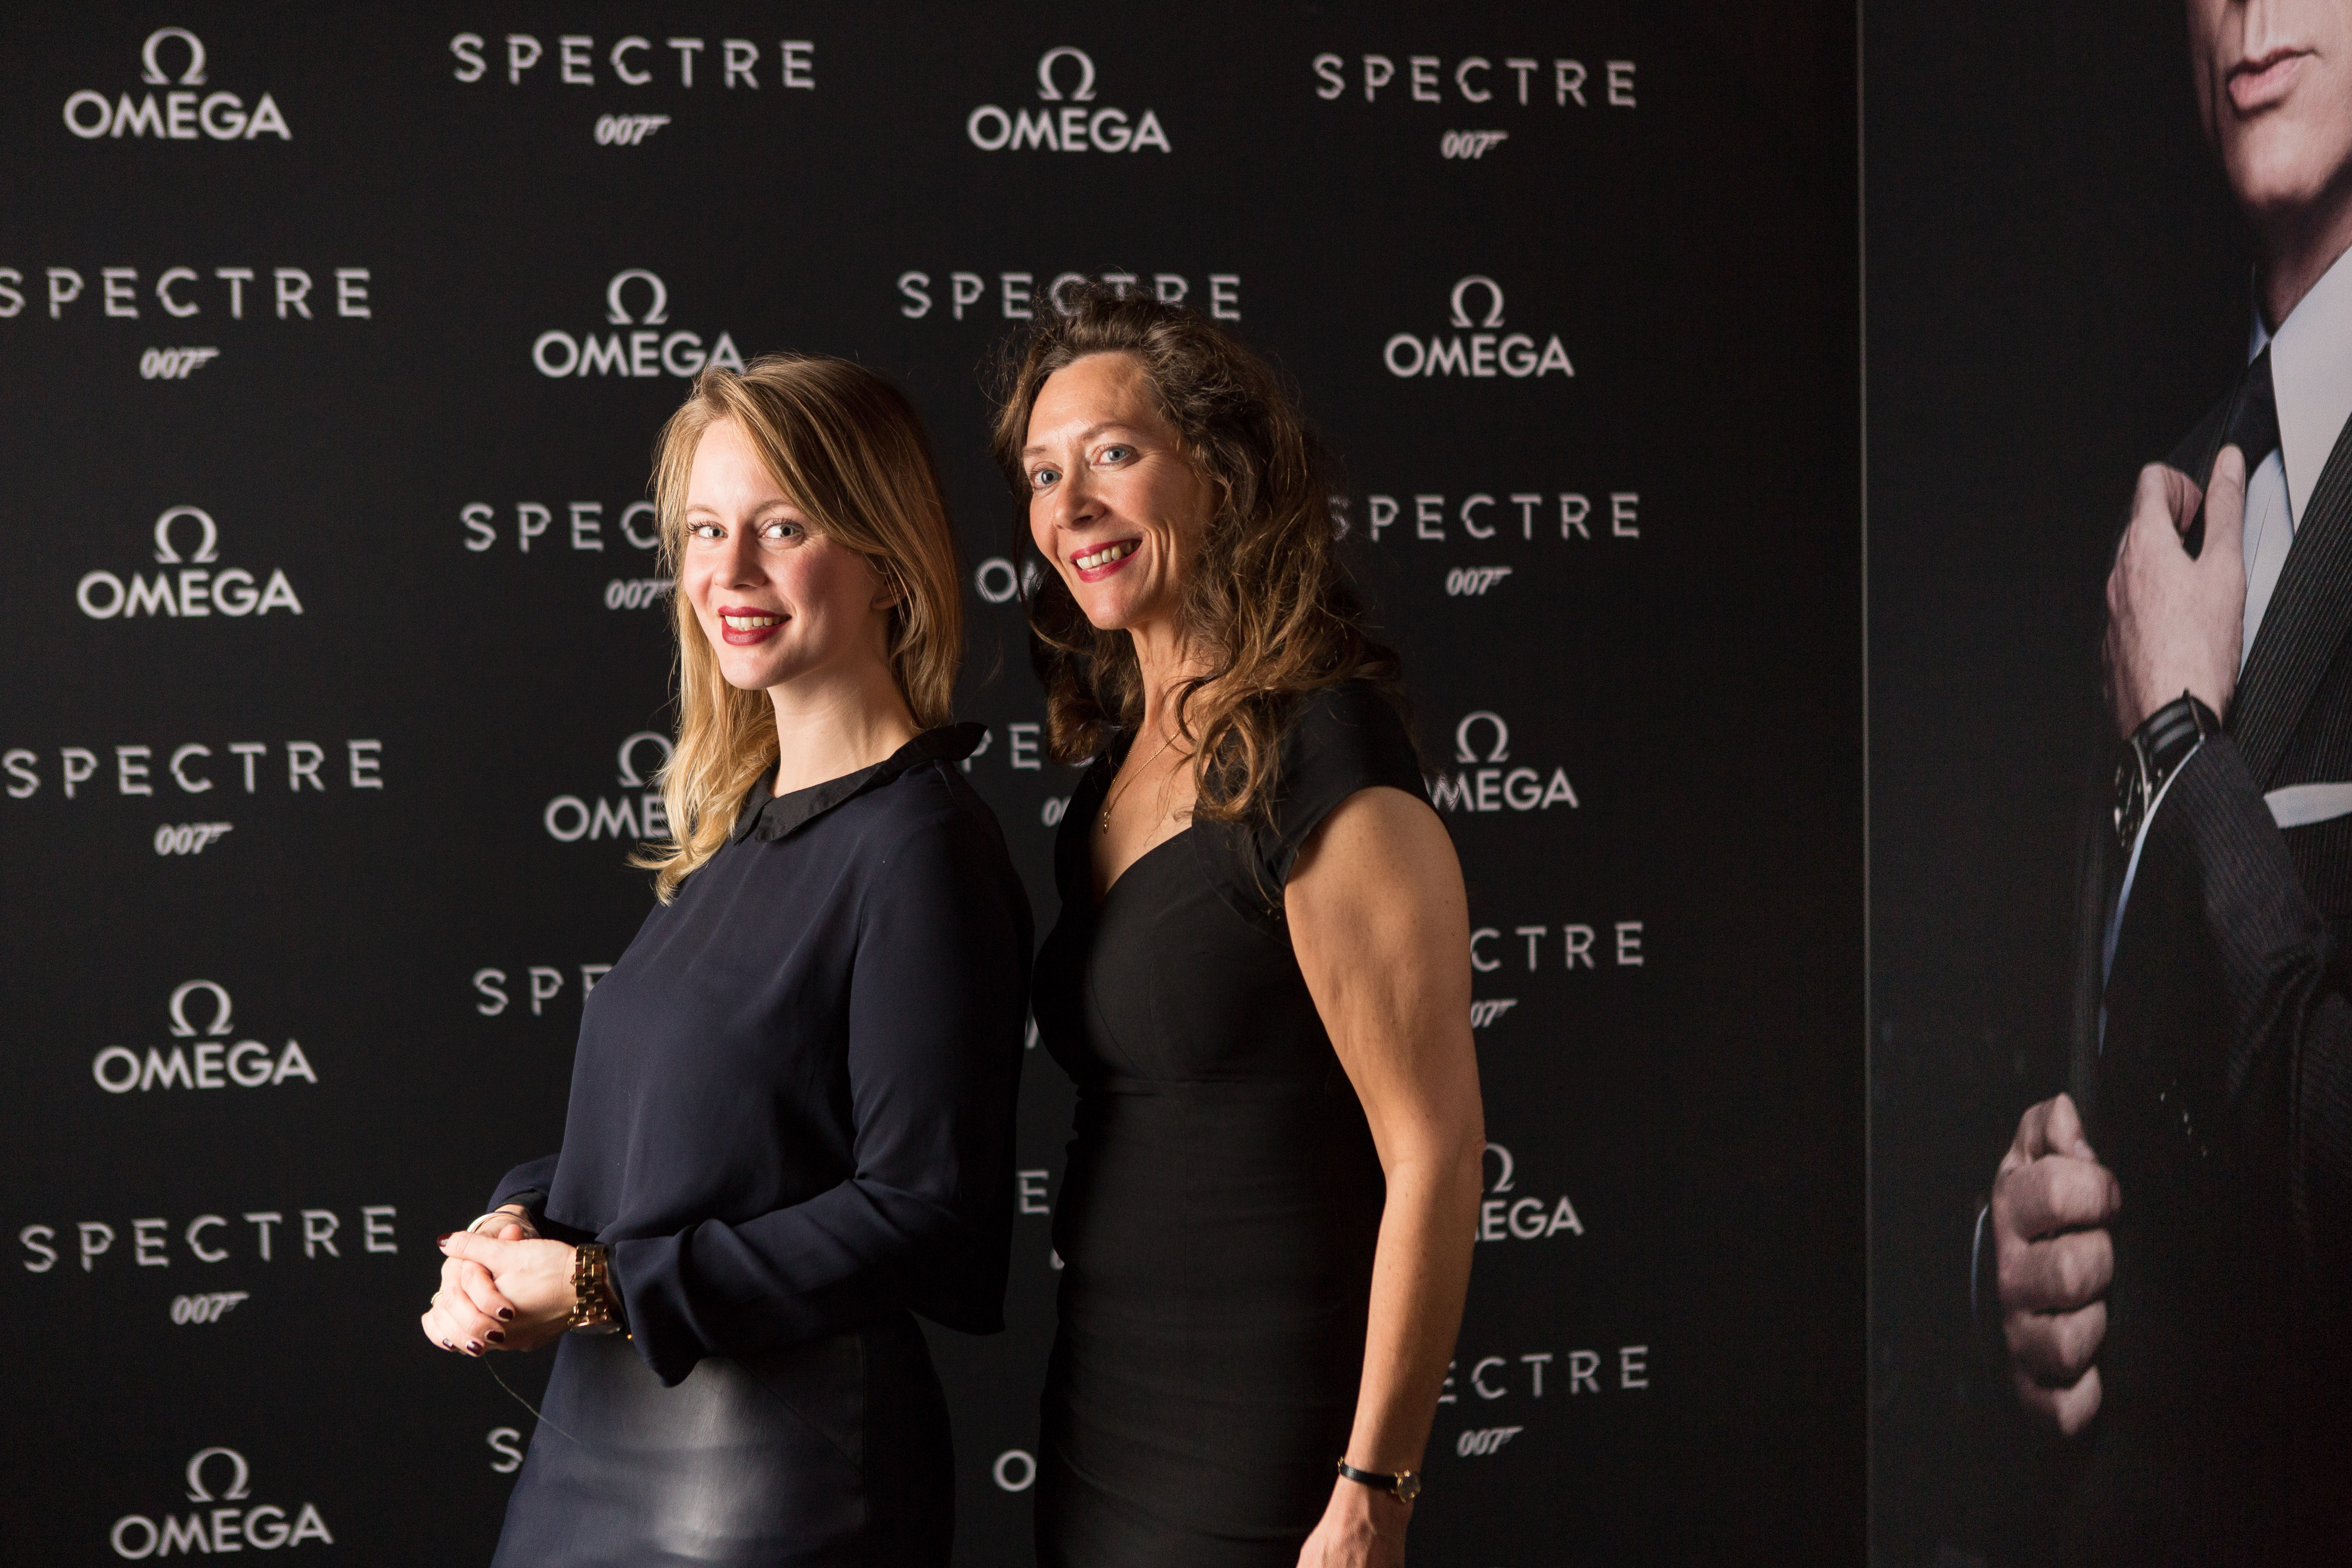 spectre-omega wall-66